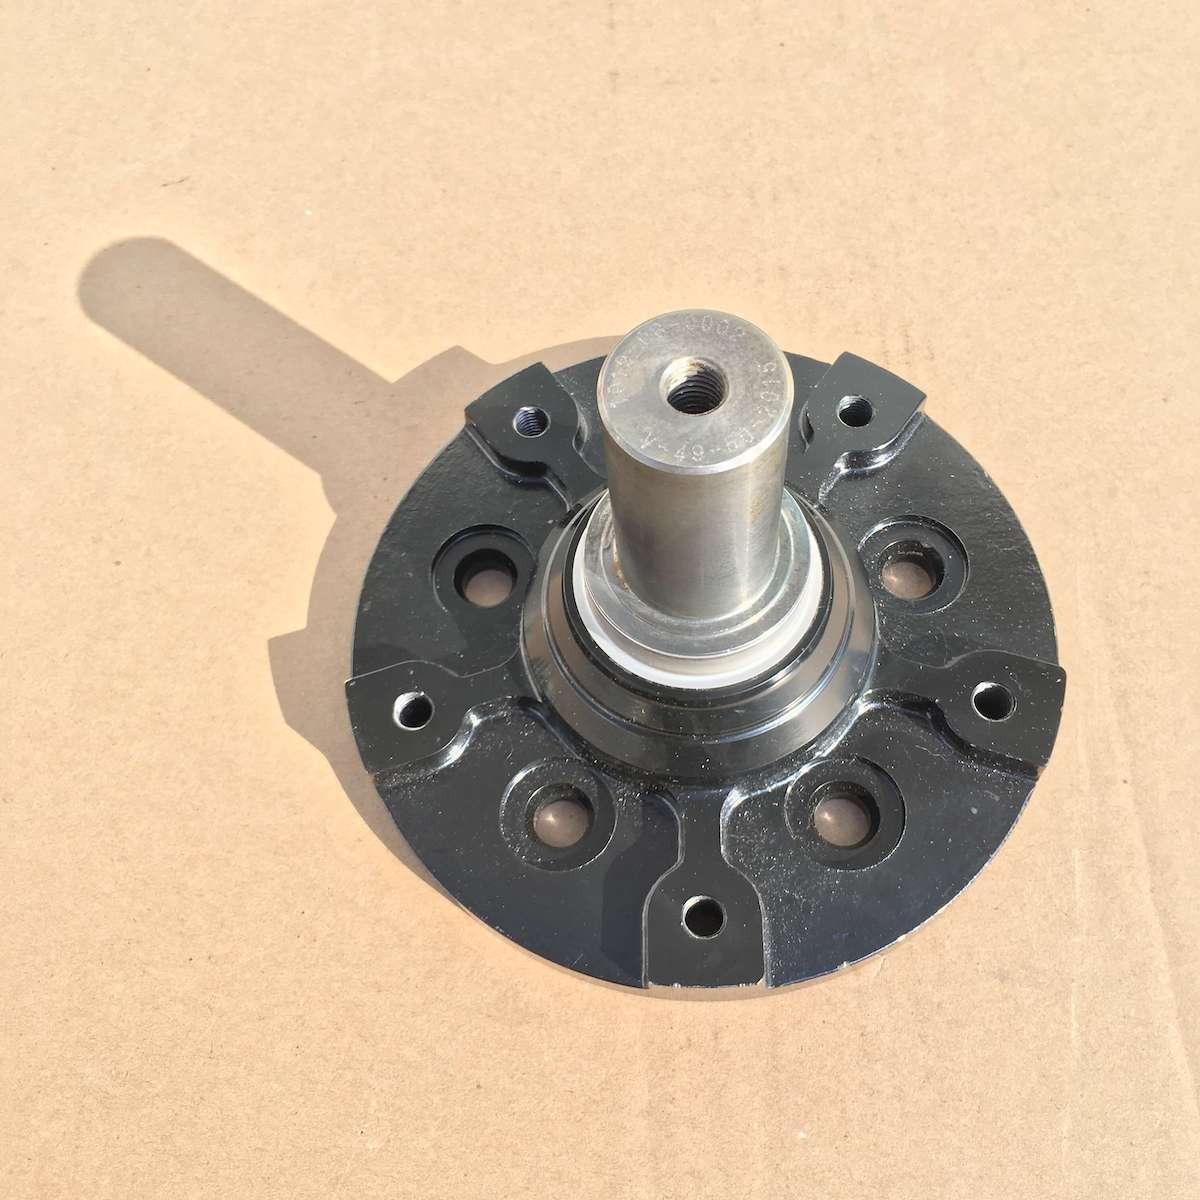 Camso hub spindle